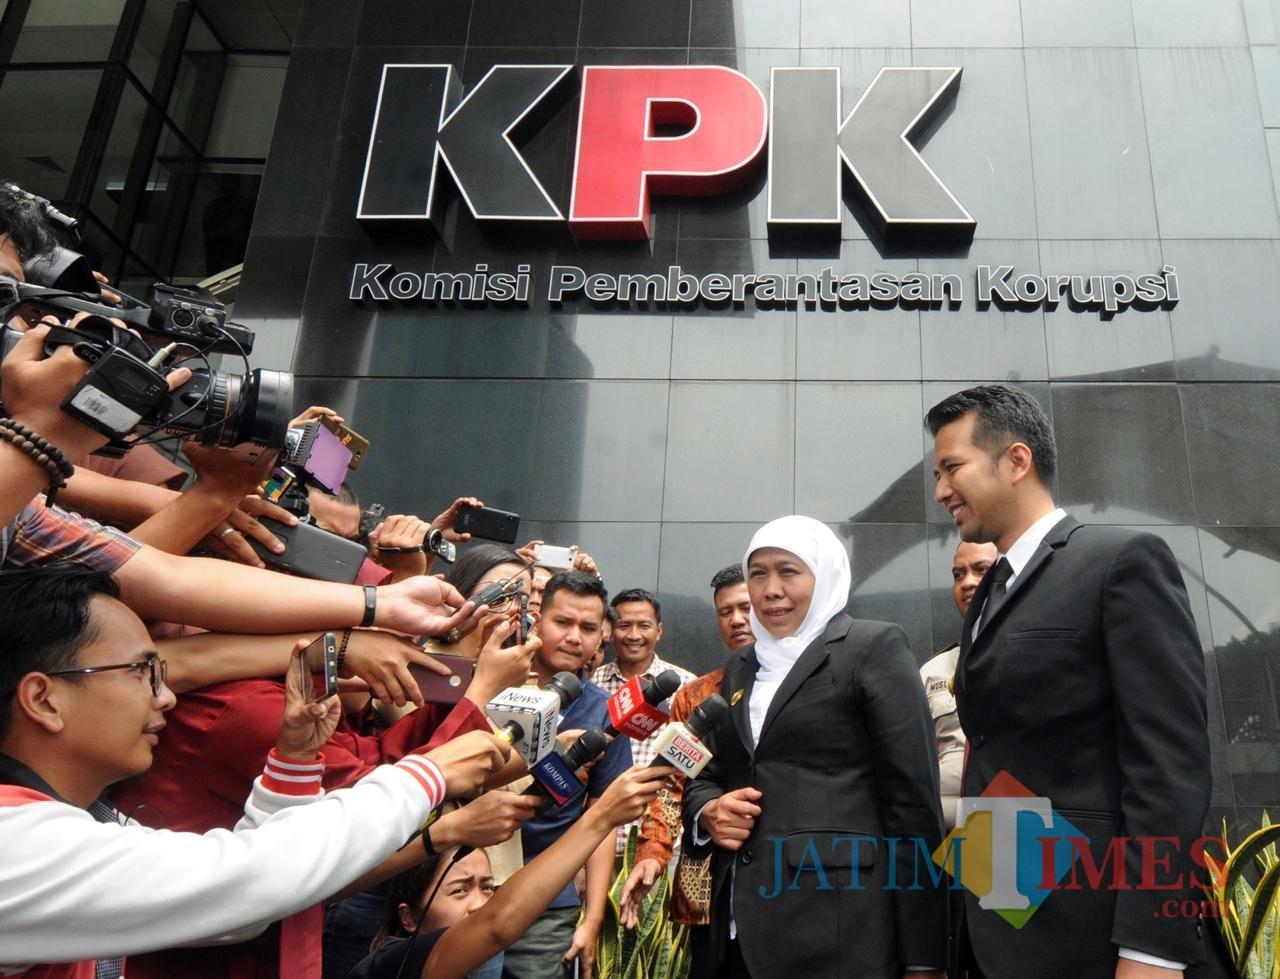 Gubernur Jatim Khofifah Indar Parawansa saat mengunjungi gedung KPK